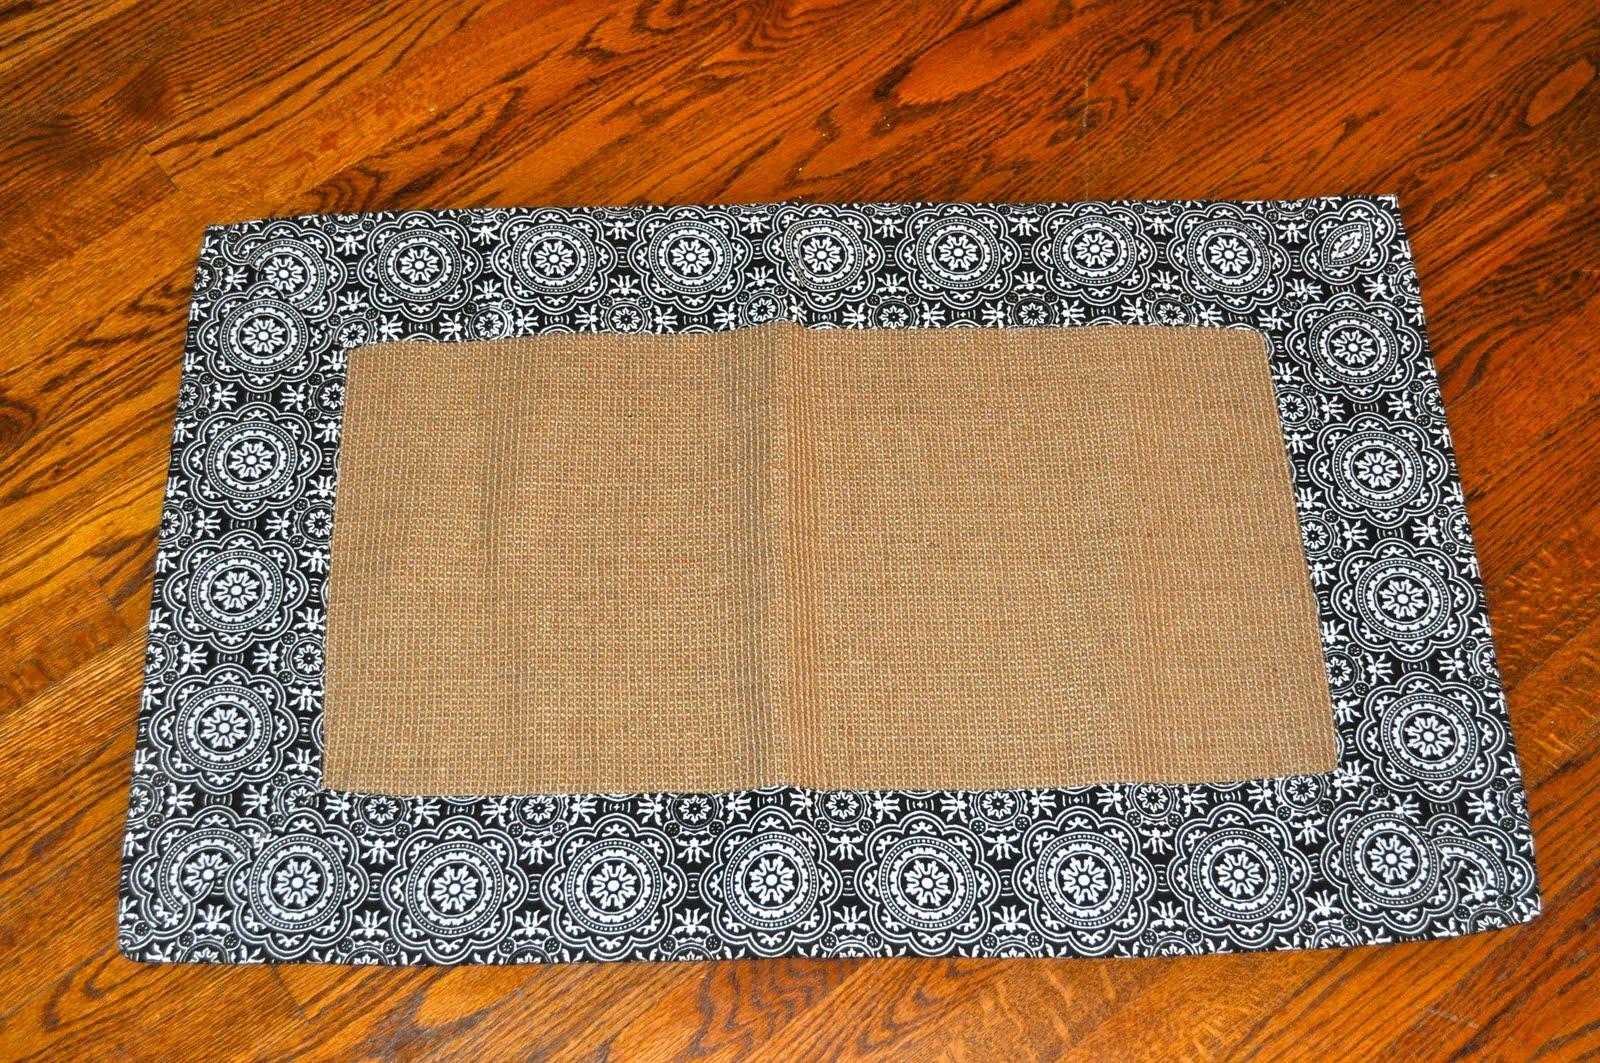 Martha Shmartha: Freezer Paper Monogrammed Doormat Tutorial